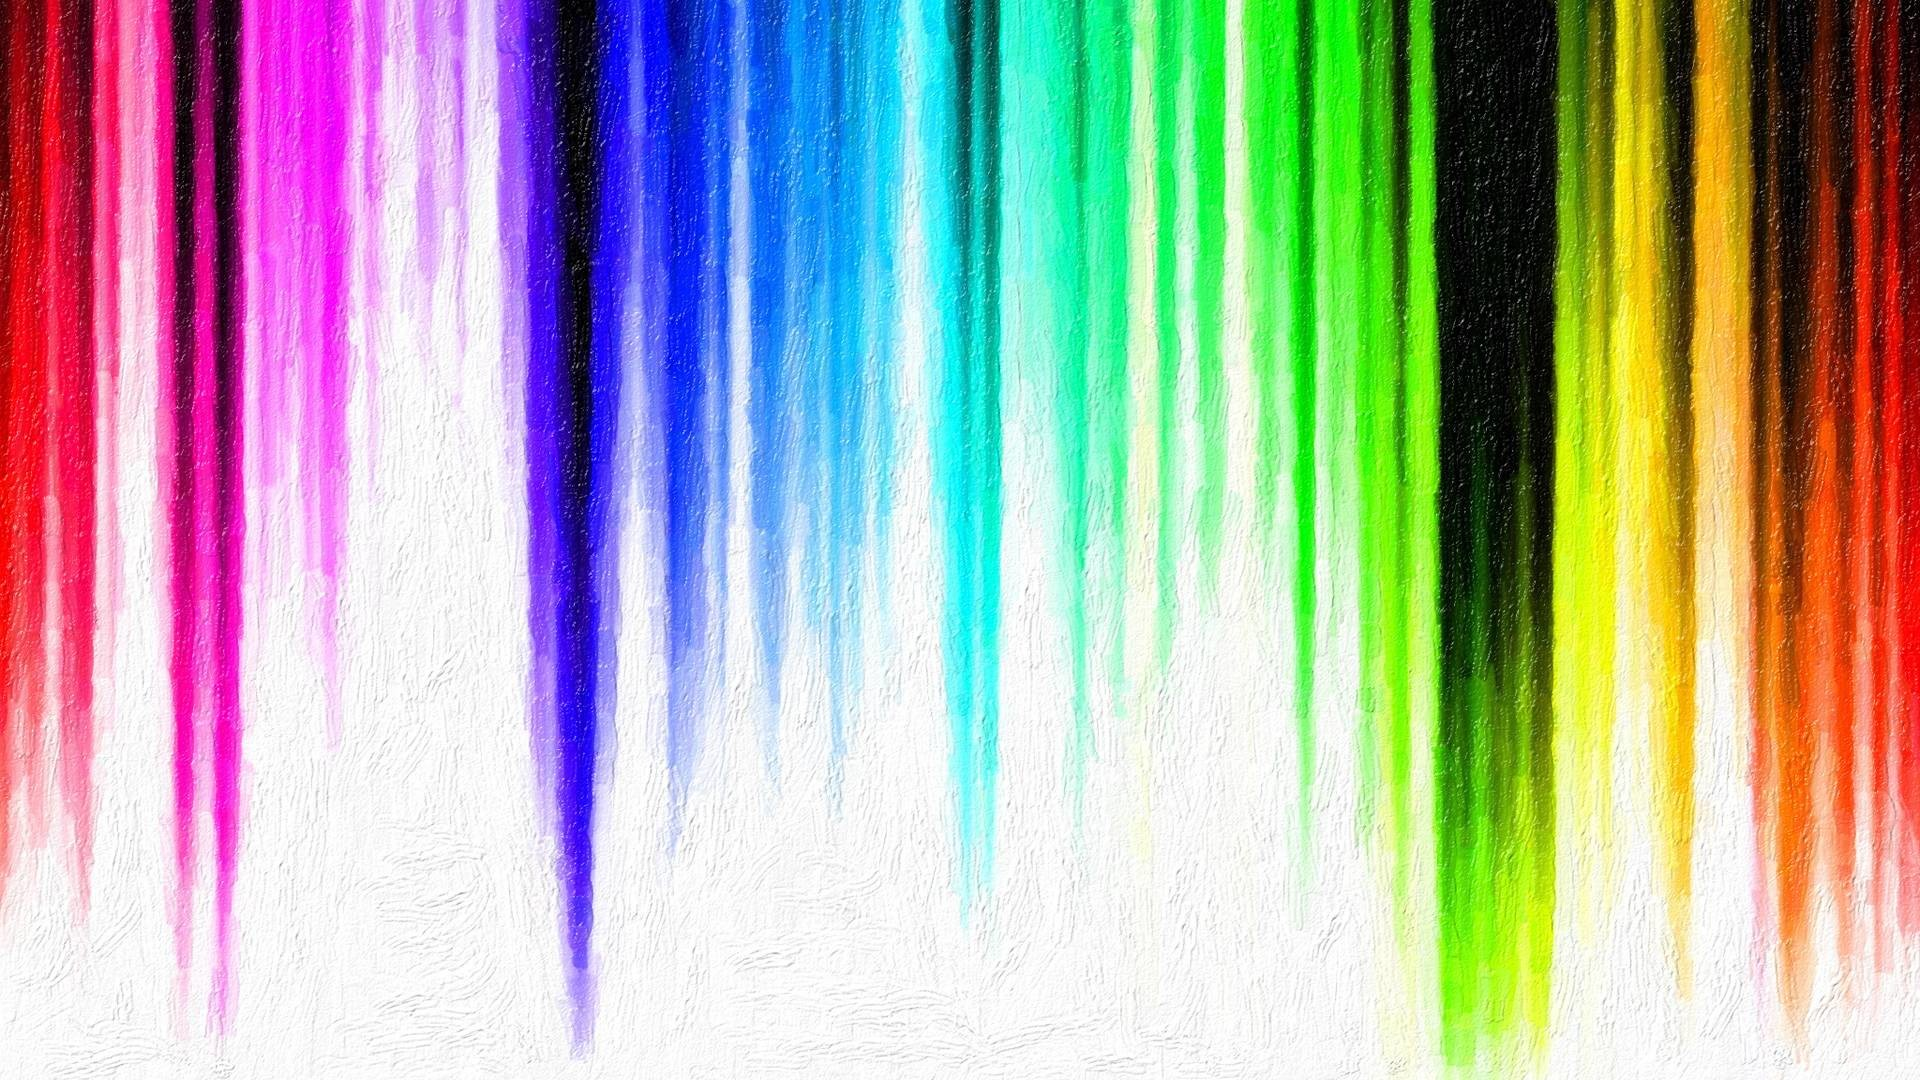 Rainbow Colors & Stripes HD Wallpaper @ 1080p HD Wallpapers